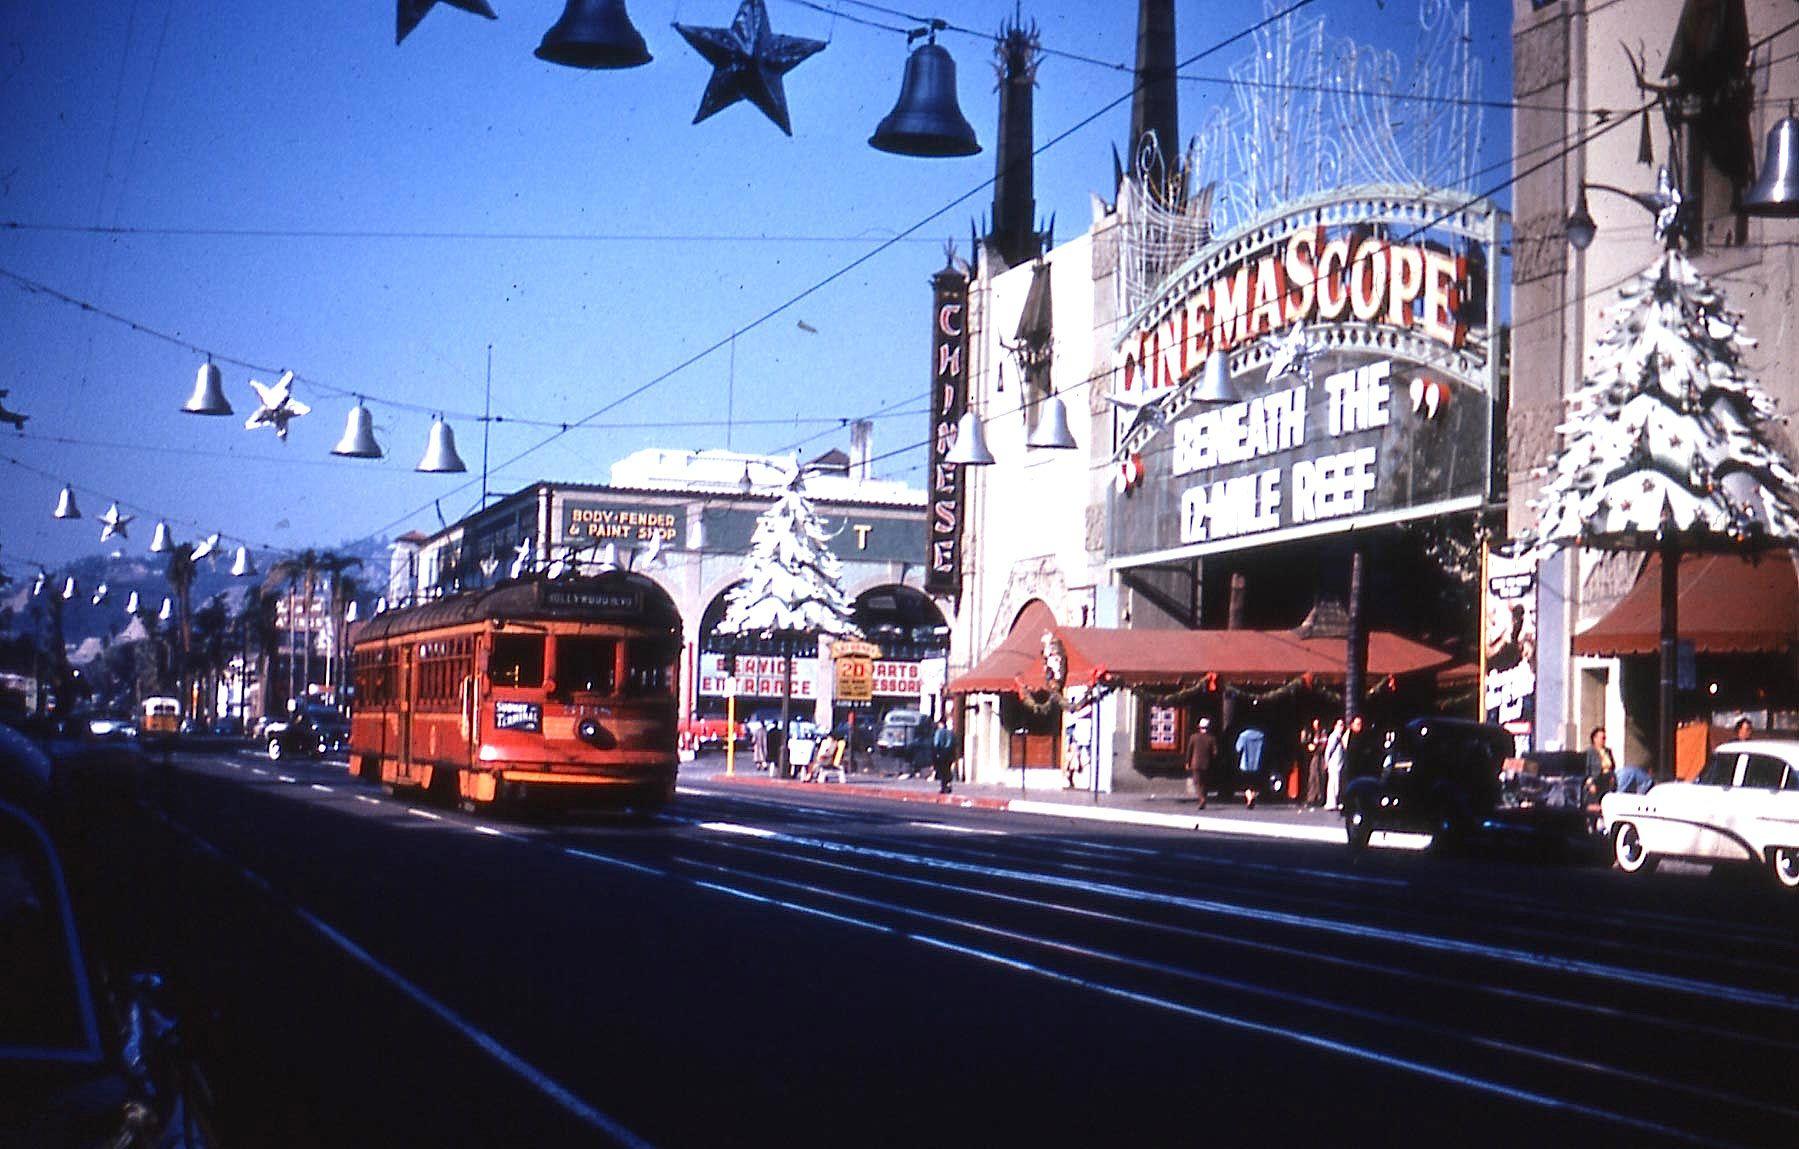 #HollywoodBoulevard and #Grauman'sChineseTheatre ...